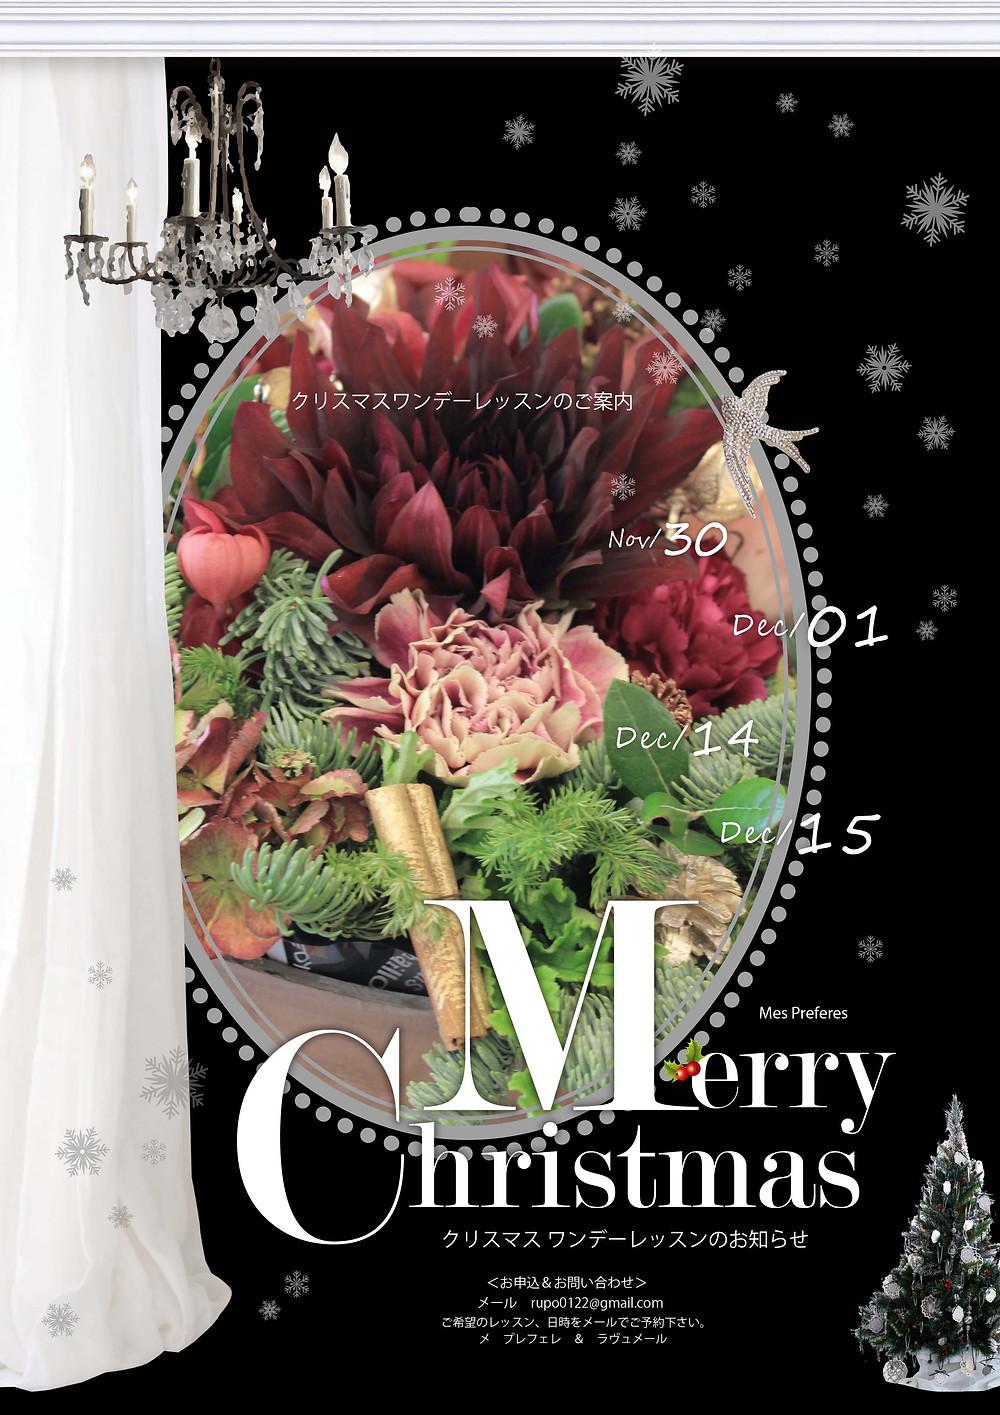 img_Christmas 表のコピー.jpg